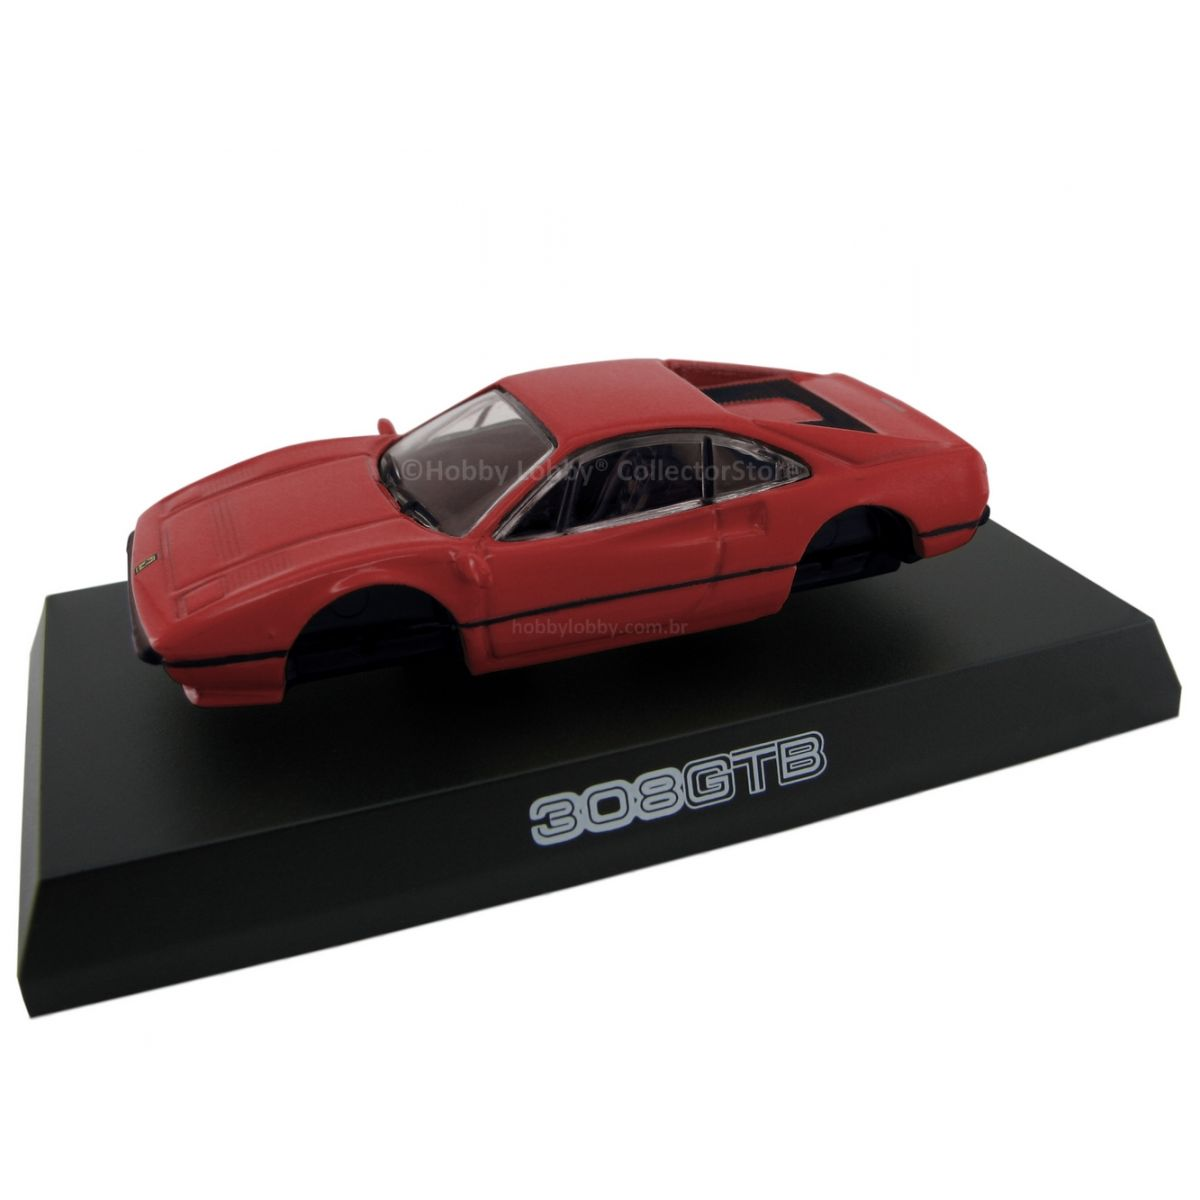 Kyosho - Ferrari Minicar Collection II - Ferrari 308 GTB (vermelha)  - Hobby Lobby CollectorStore